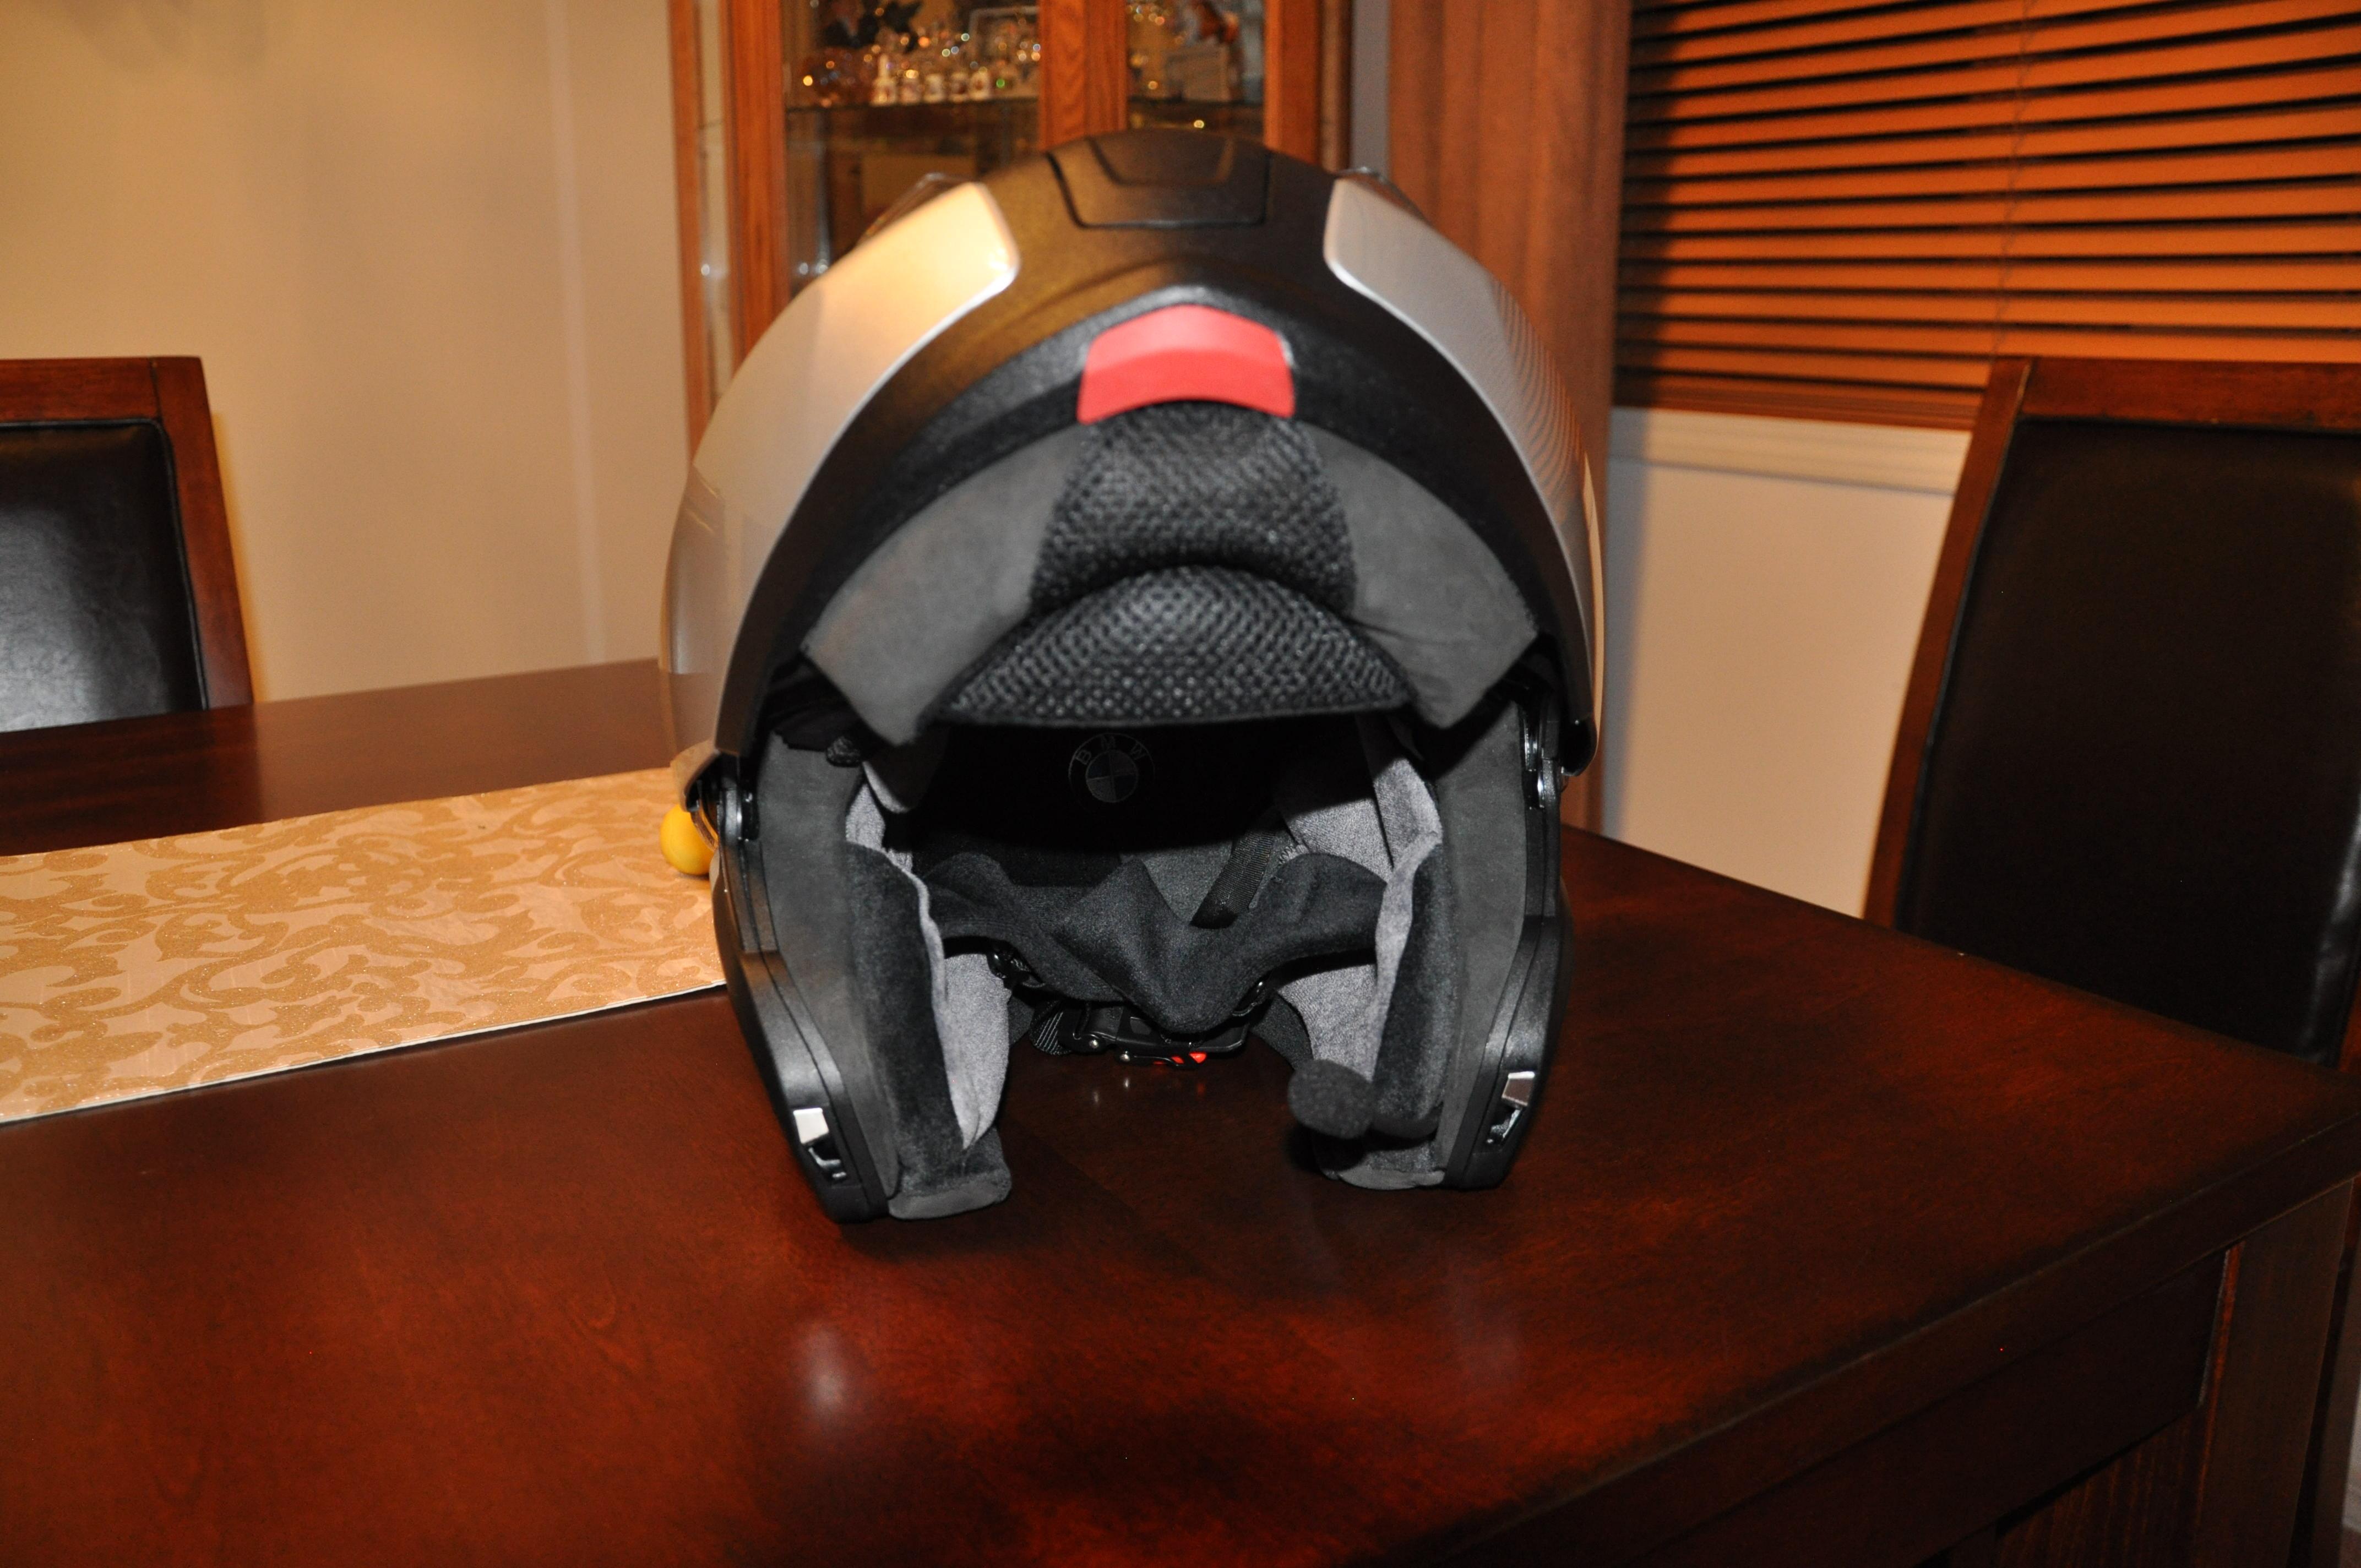 bmw system 6 evo helmet bmw luxury touring community. Black Bedroom Furniture Sets. Home Design Ideas